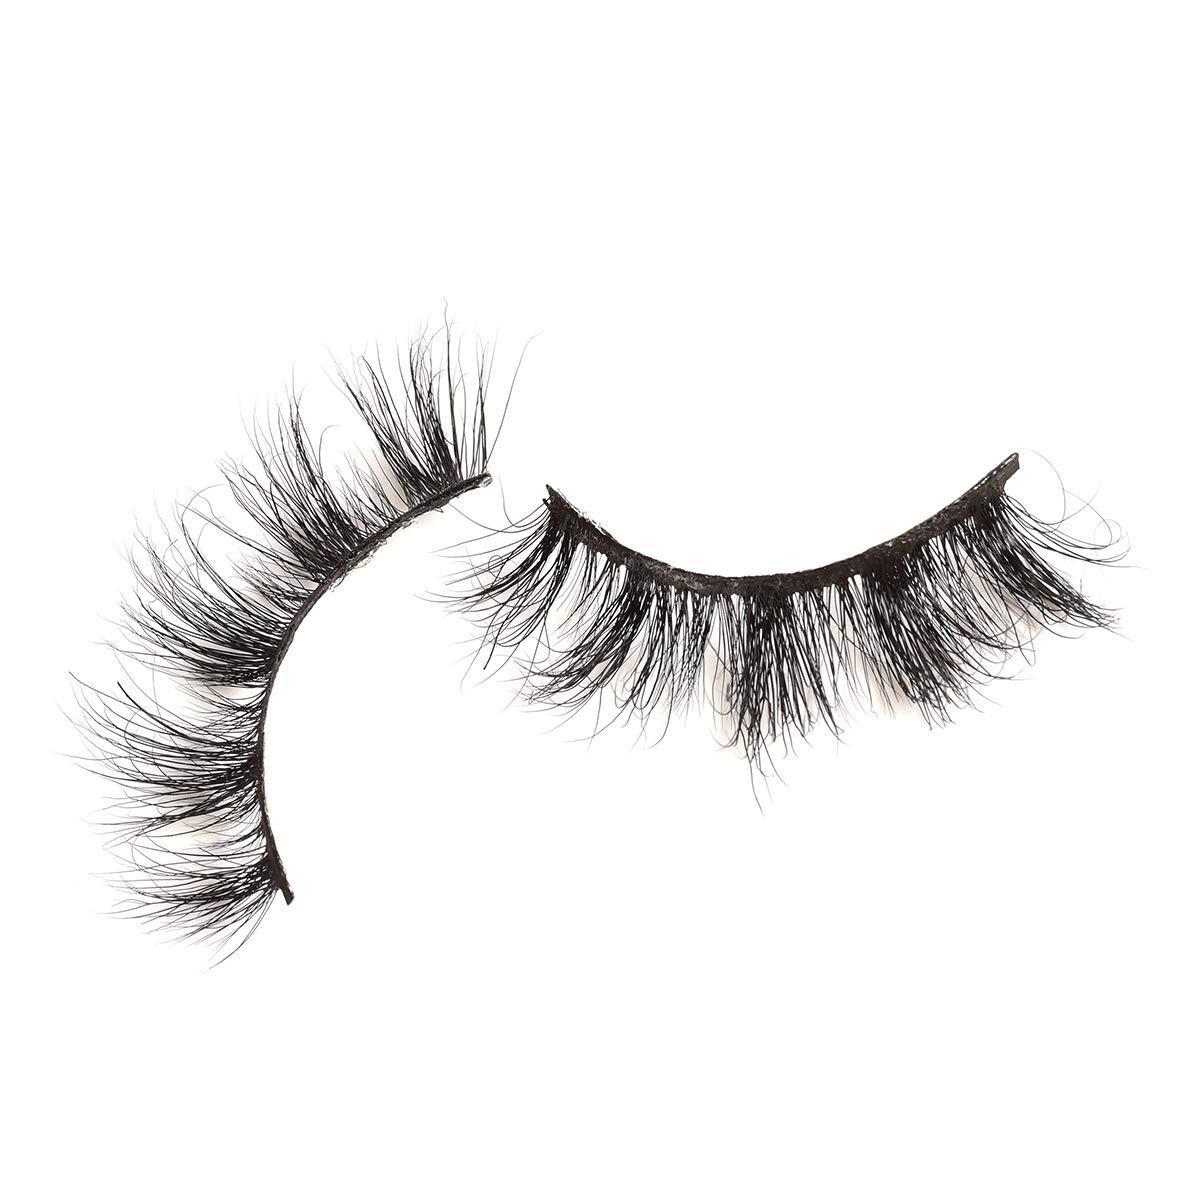 Haibara Mink Eyelashes 19mm Daily look for makeup, Natural Layered Effect Reusable Hand Made Strips Eyelashes Eco-friendly 100% Siberian Mink Fur 1 Pair (Daily E0 19mm)